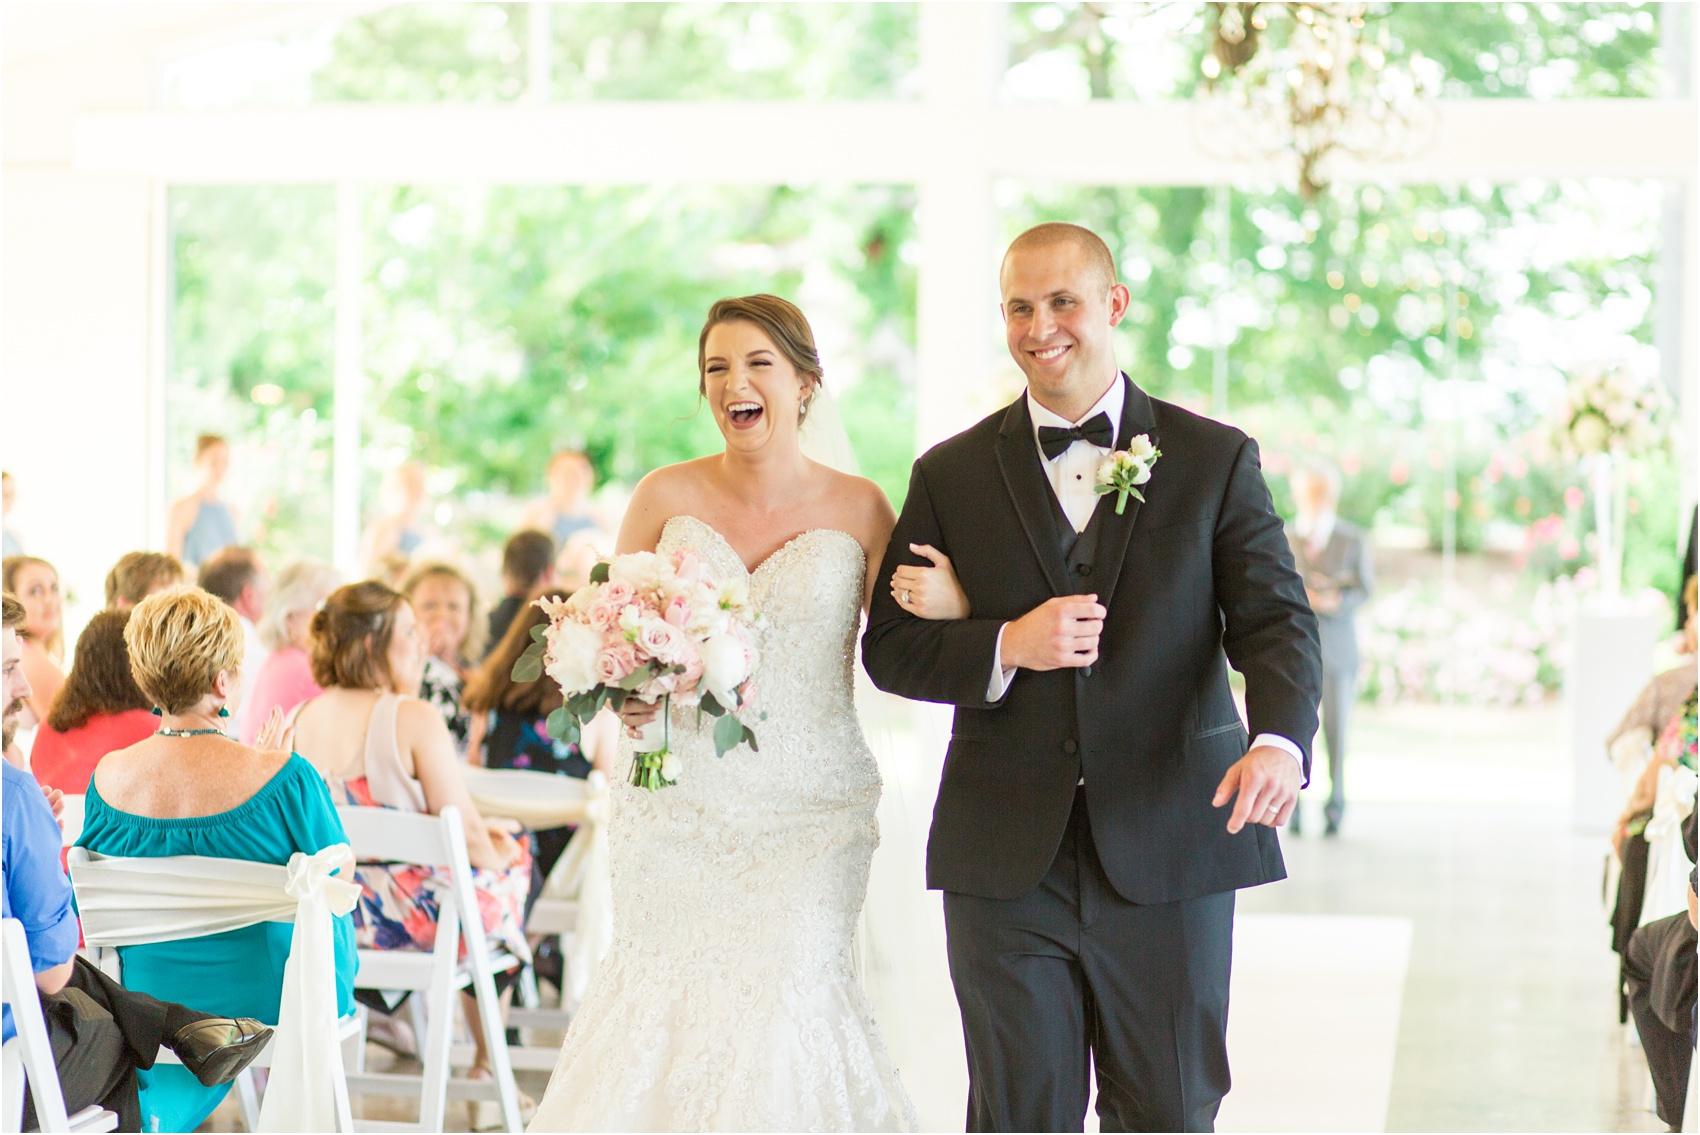 Savannah Eve Photography- Nutt Wedding- Blog-85.jpg